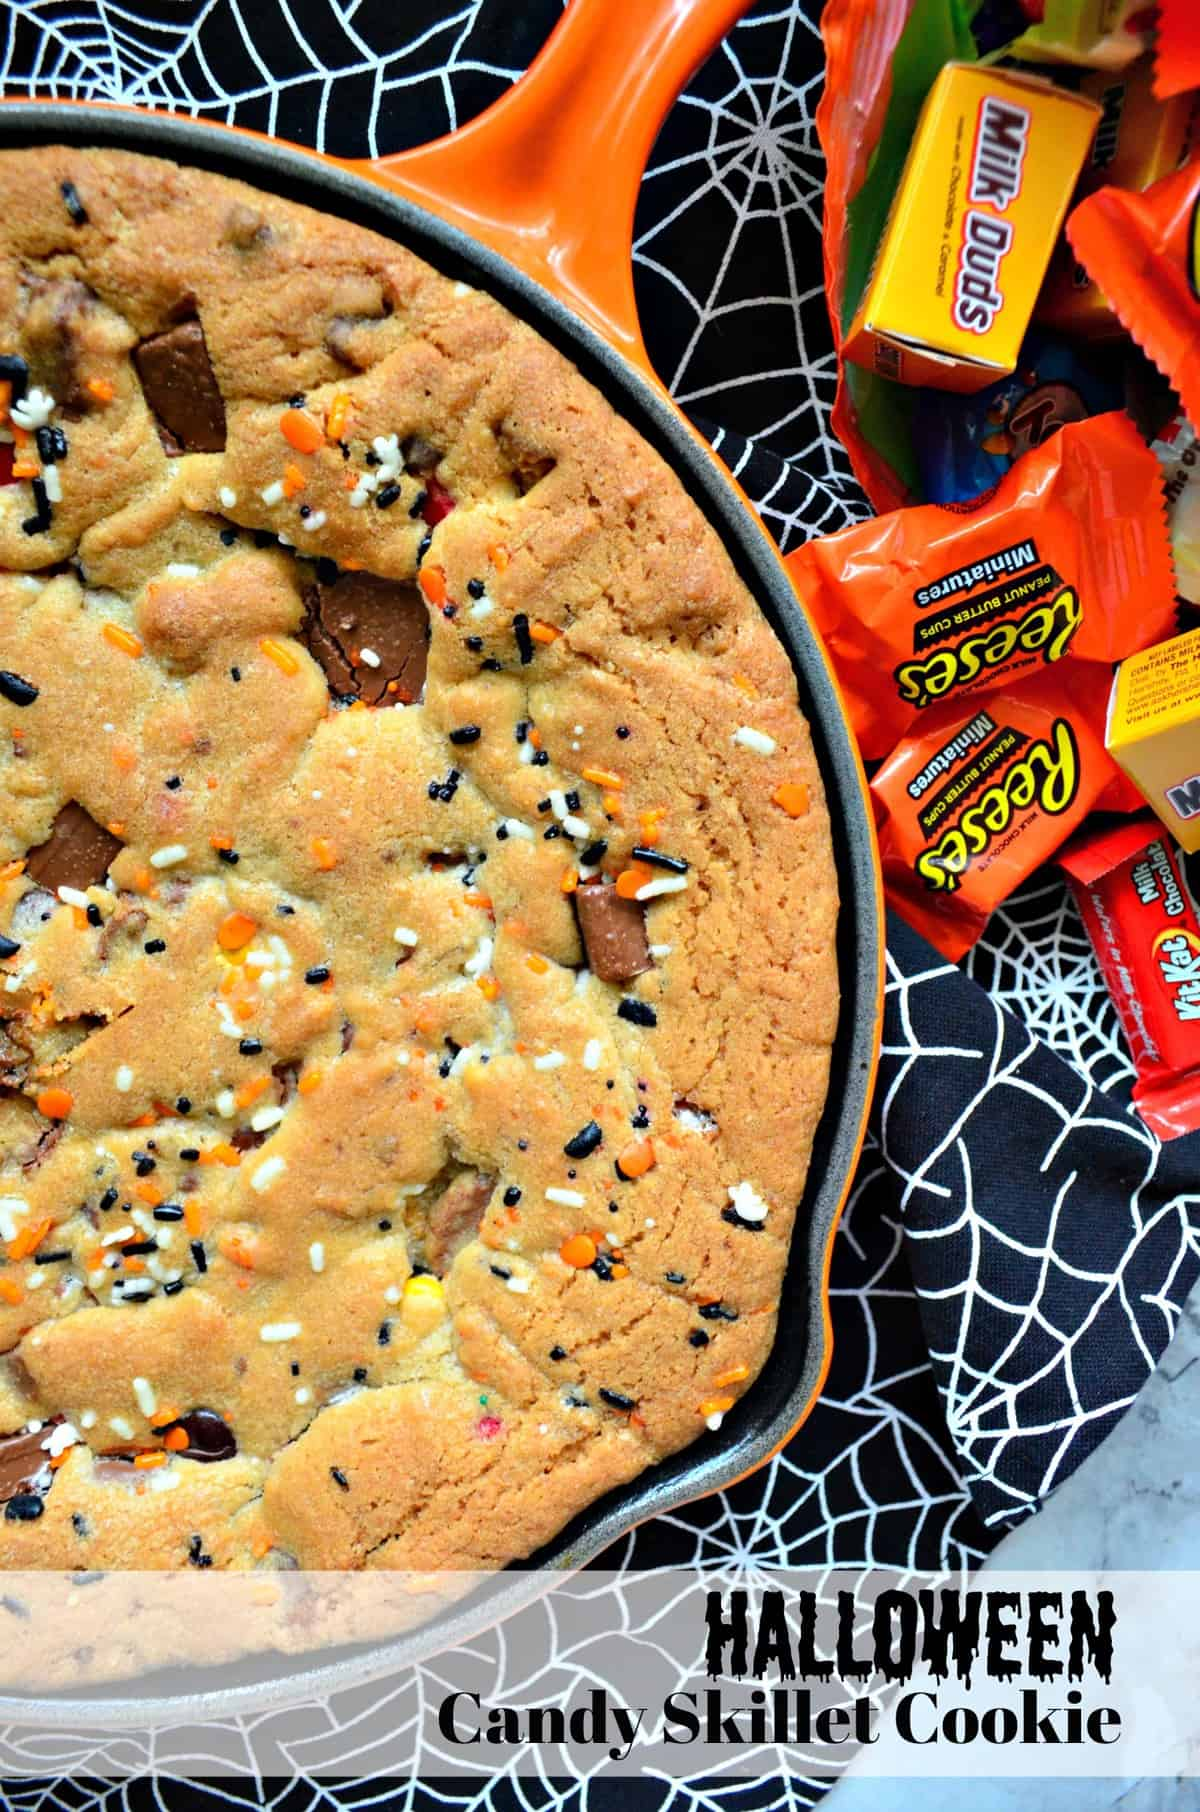 halloween candy skillet cookie #halloweentreatsweek - katie's cucina